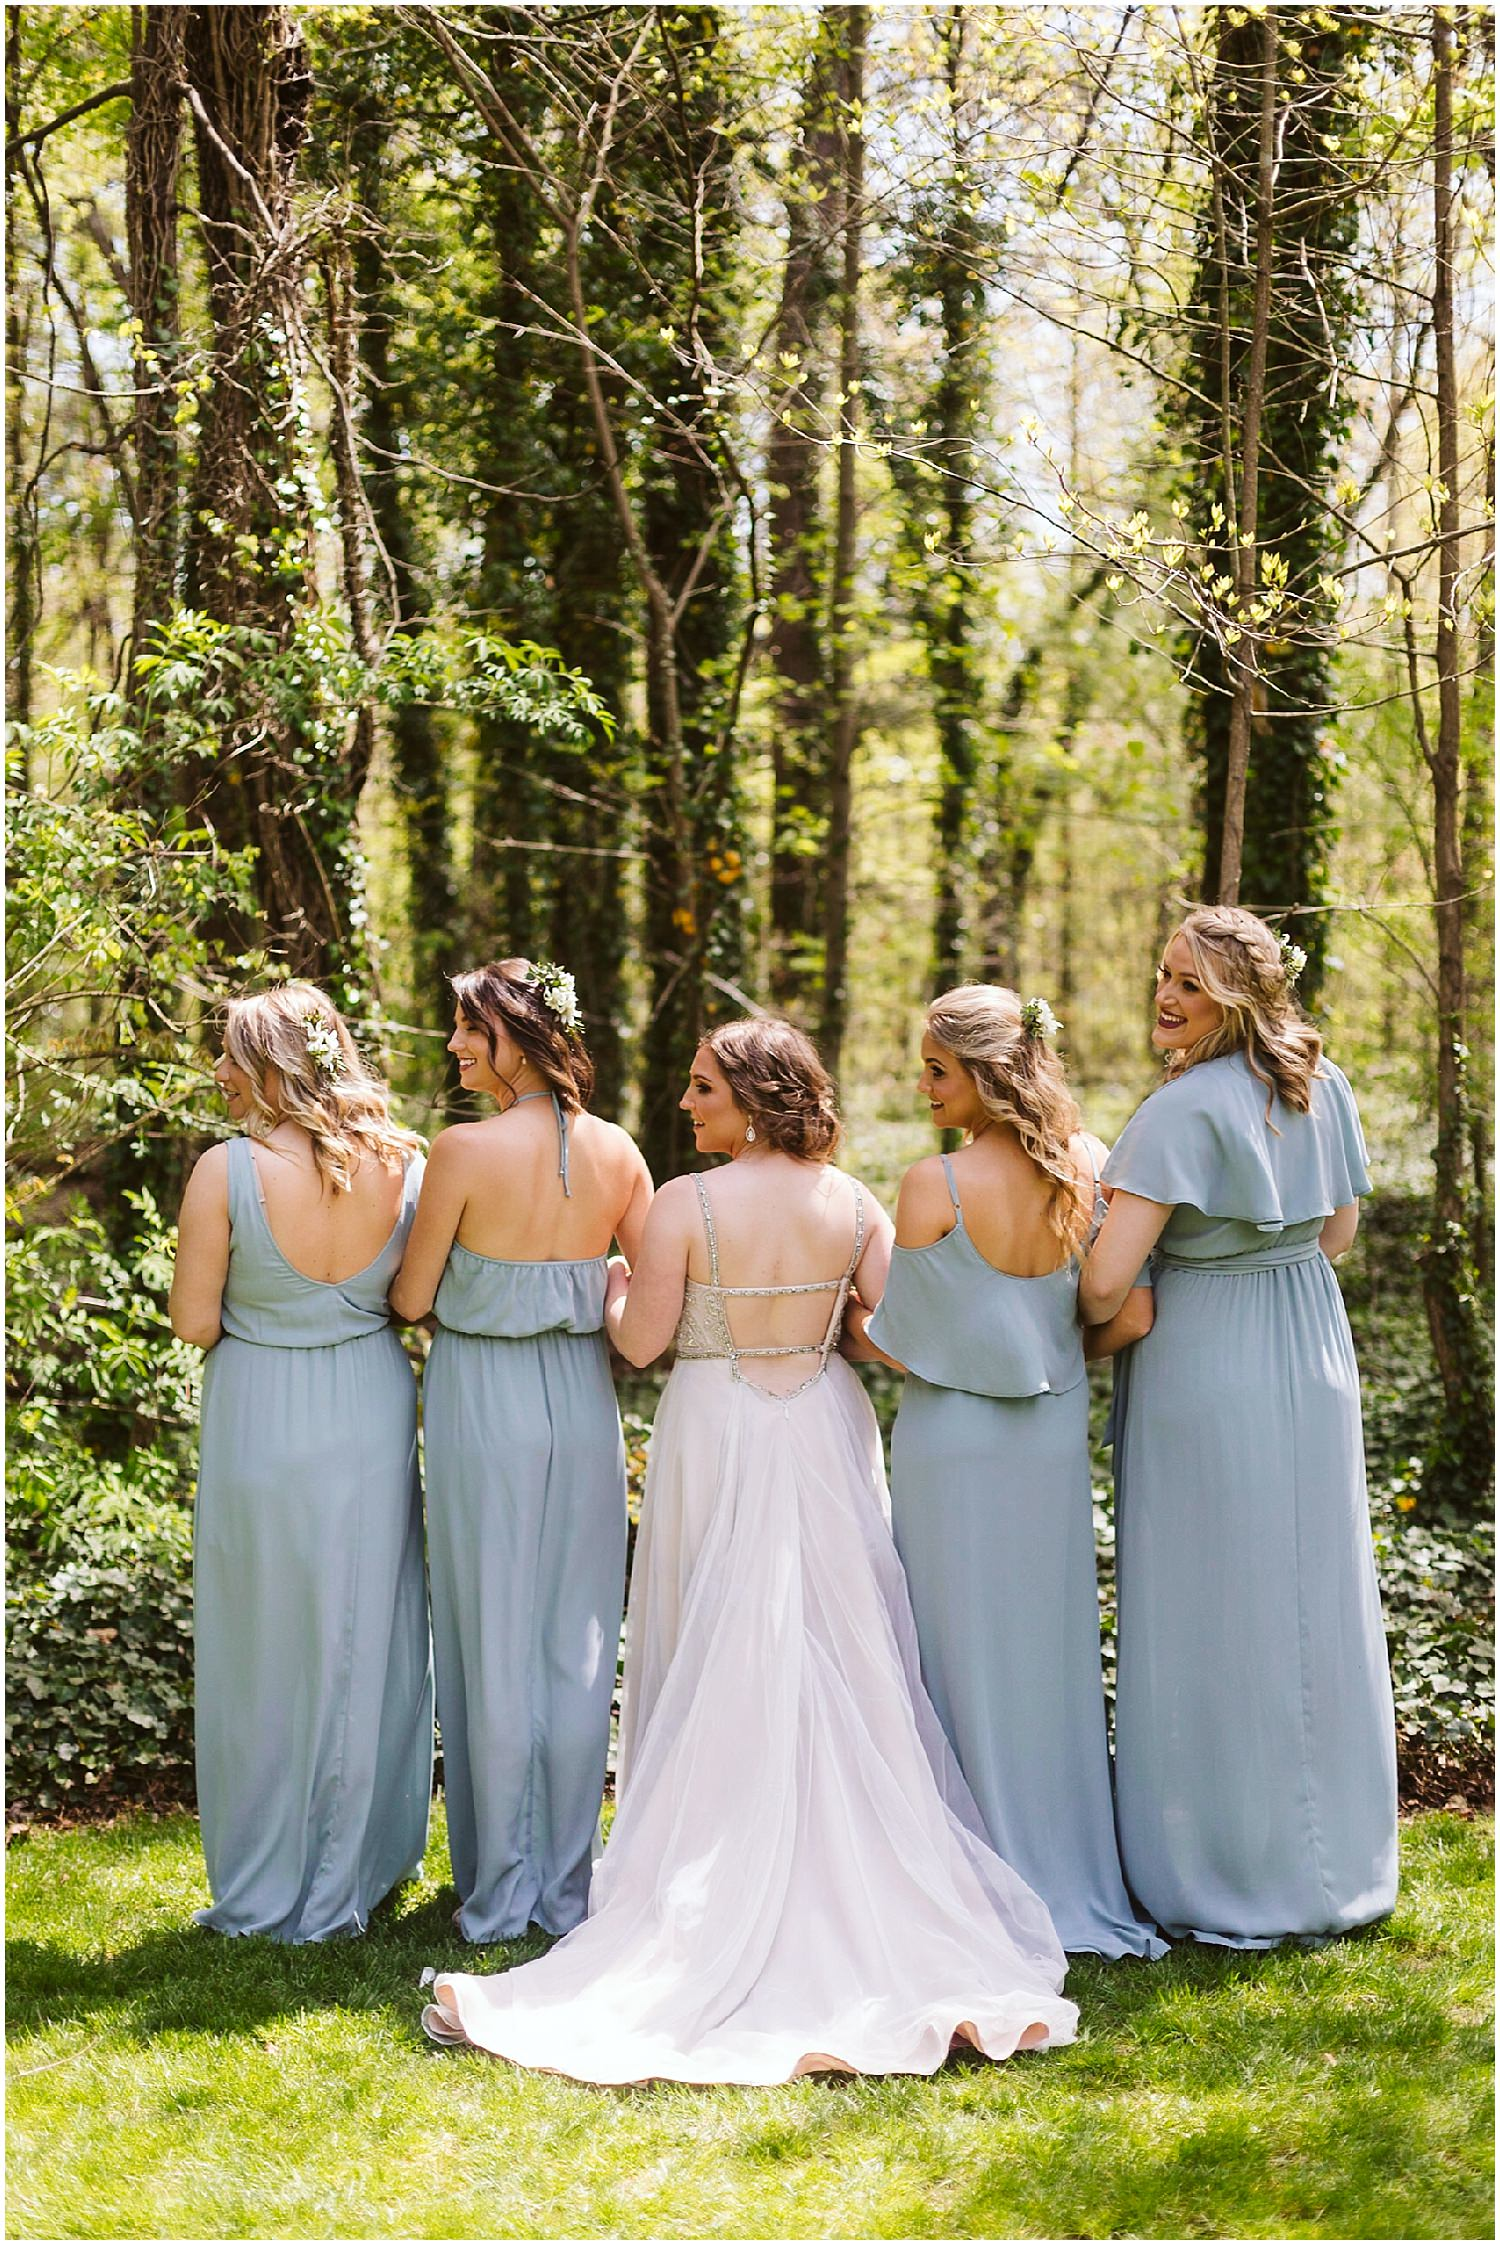 back of bridesmaids' dresses